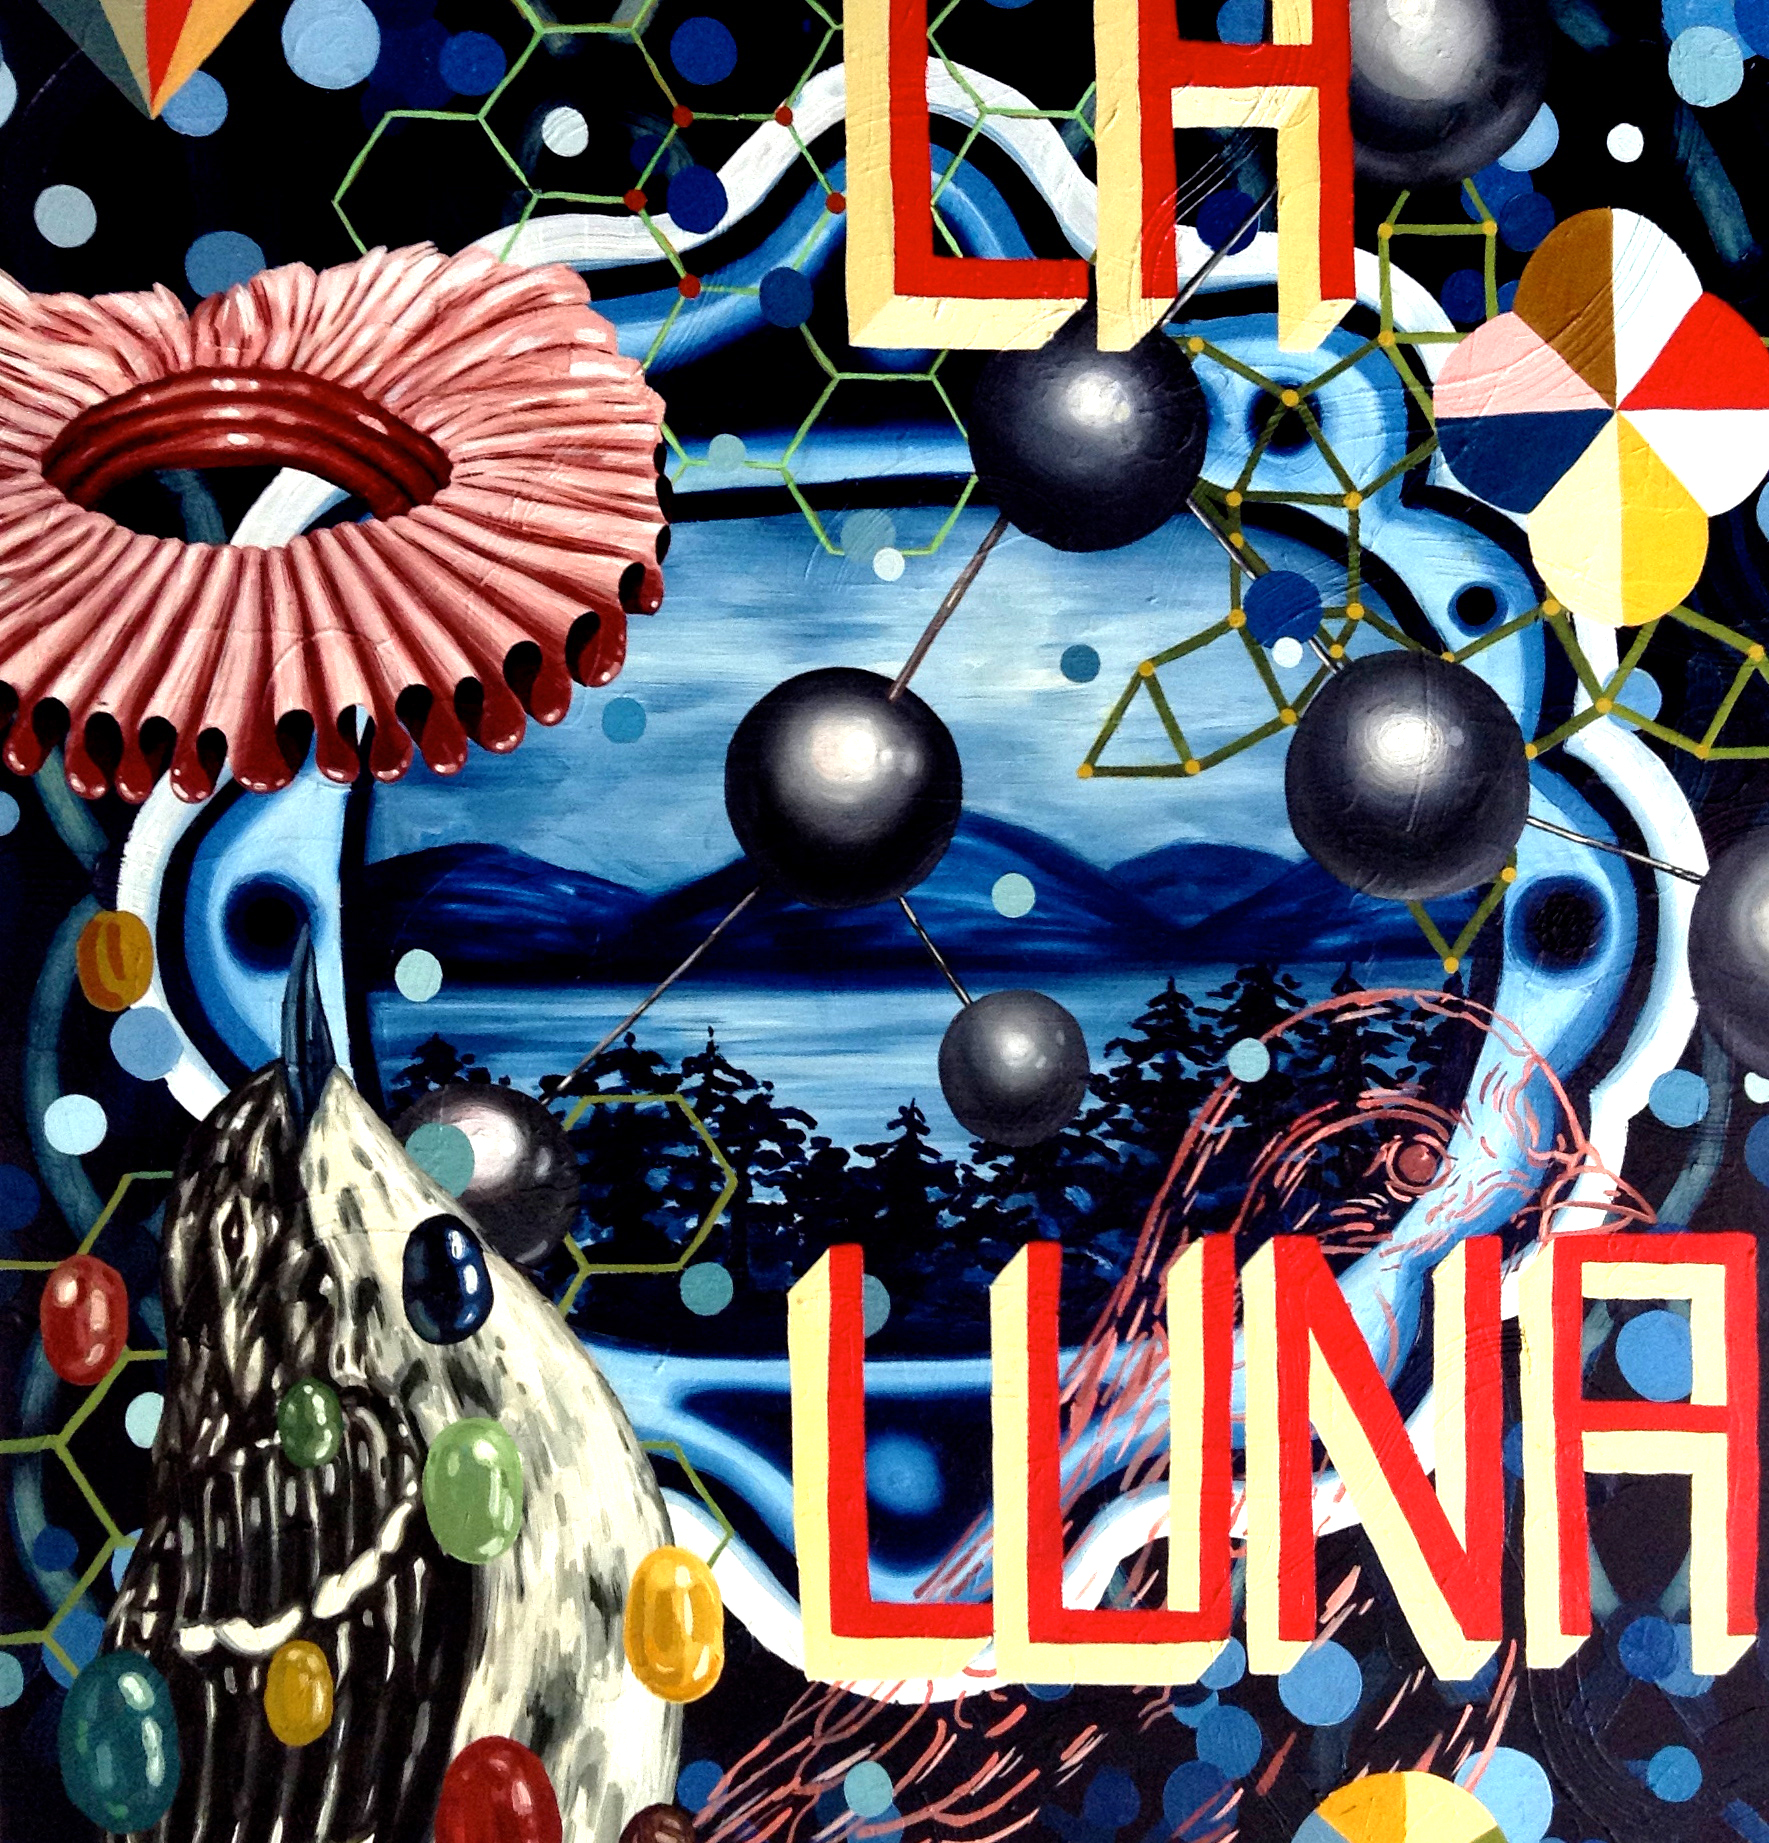 La Luna revised